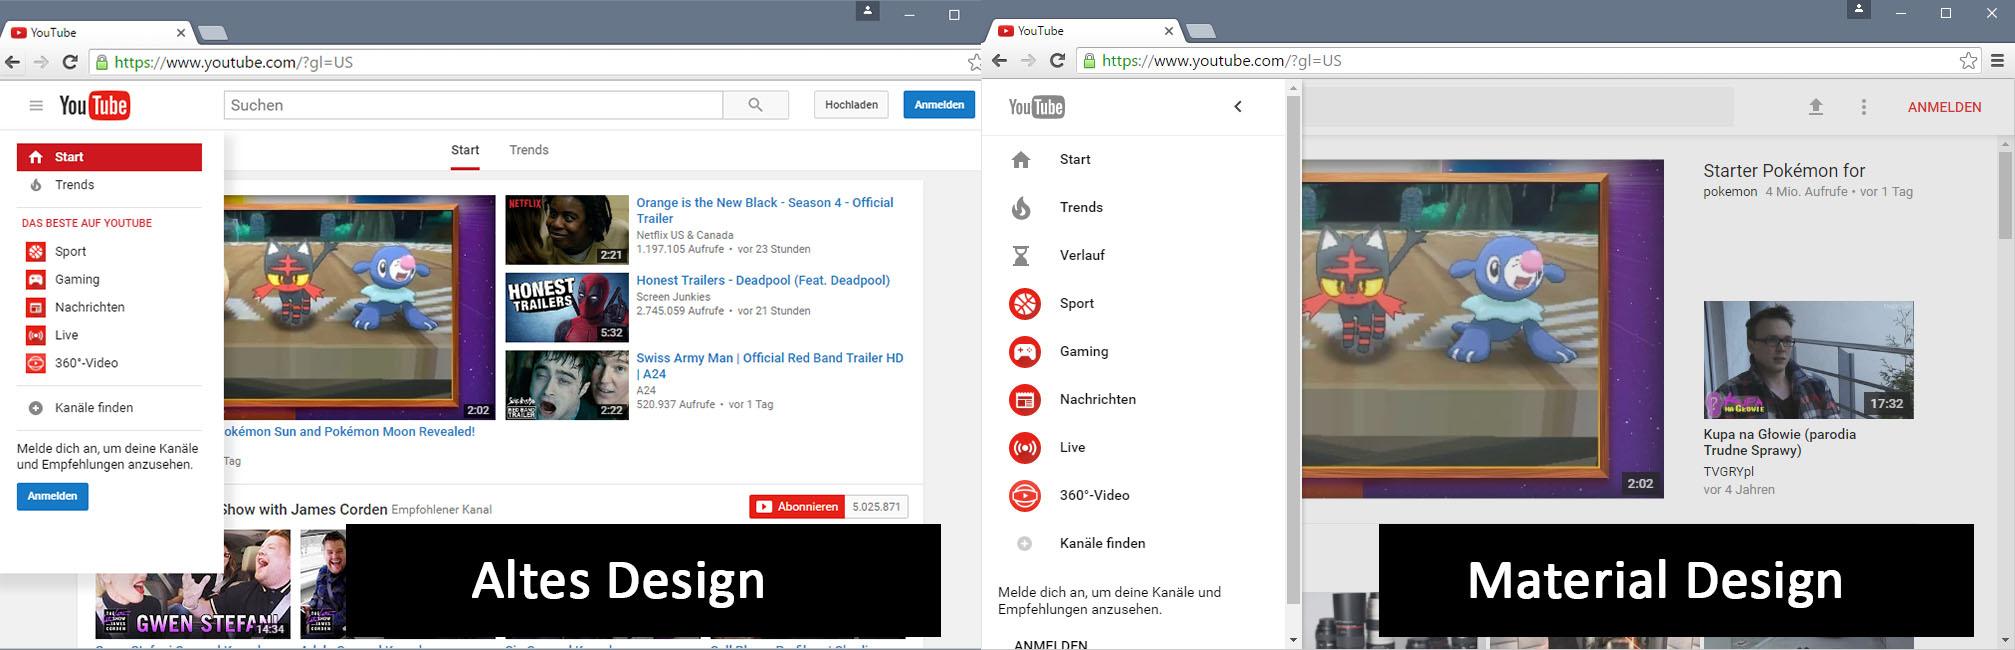 Marvelous Youtube Material Design Aktivieren So Gehts Download Free Architecture Designs Scobabritishbridgeorg